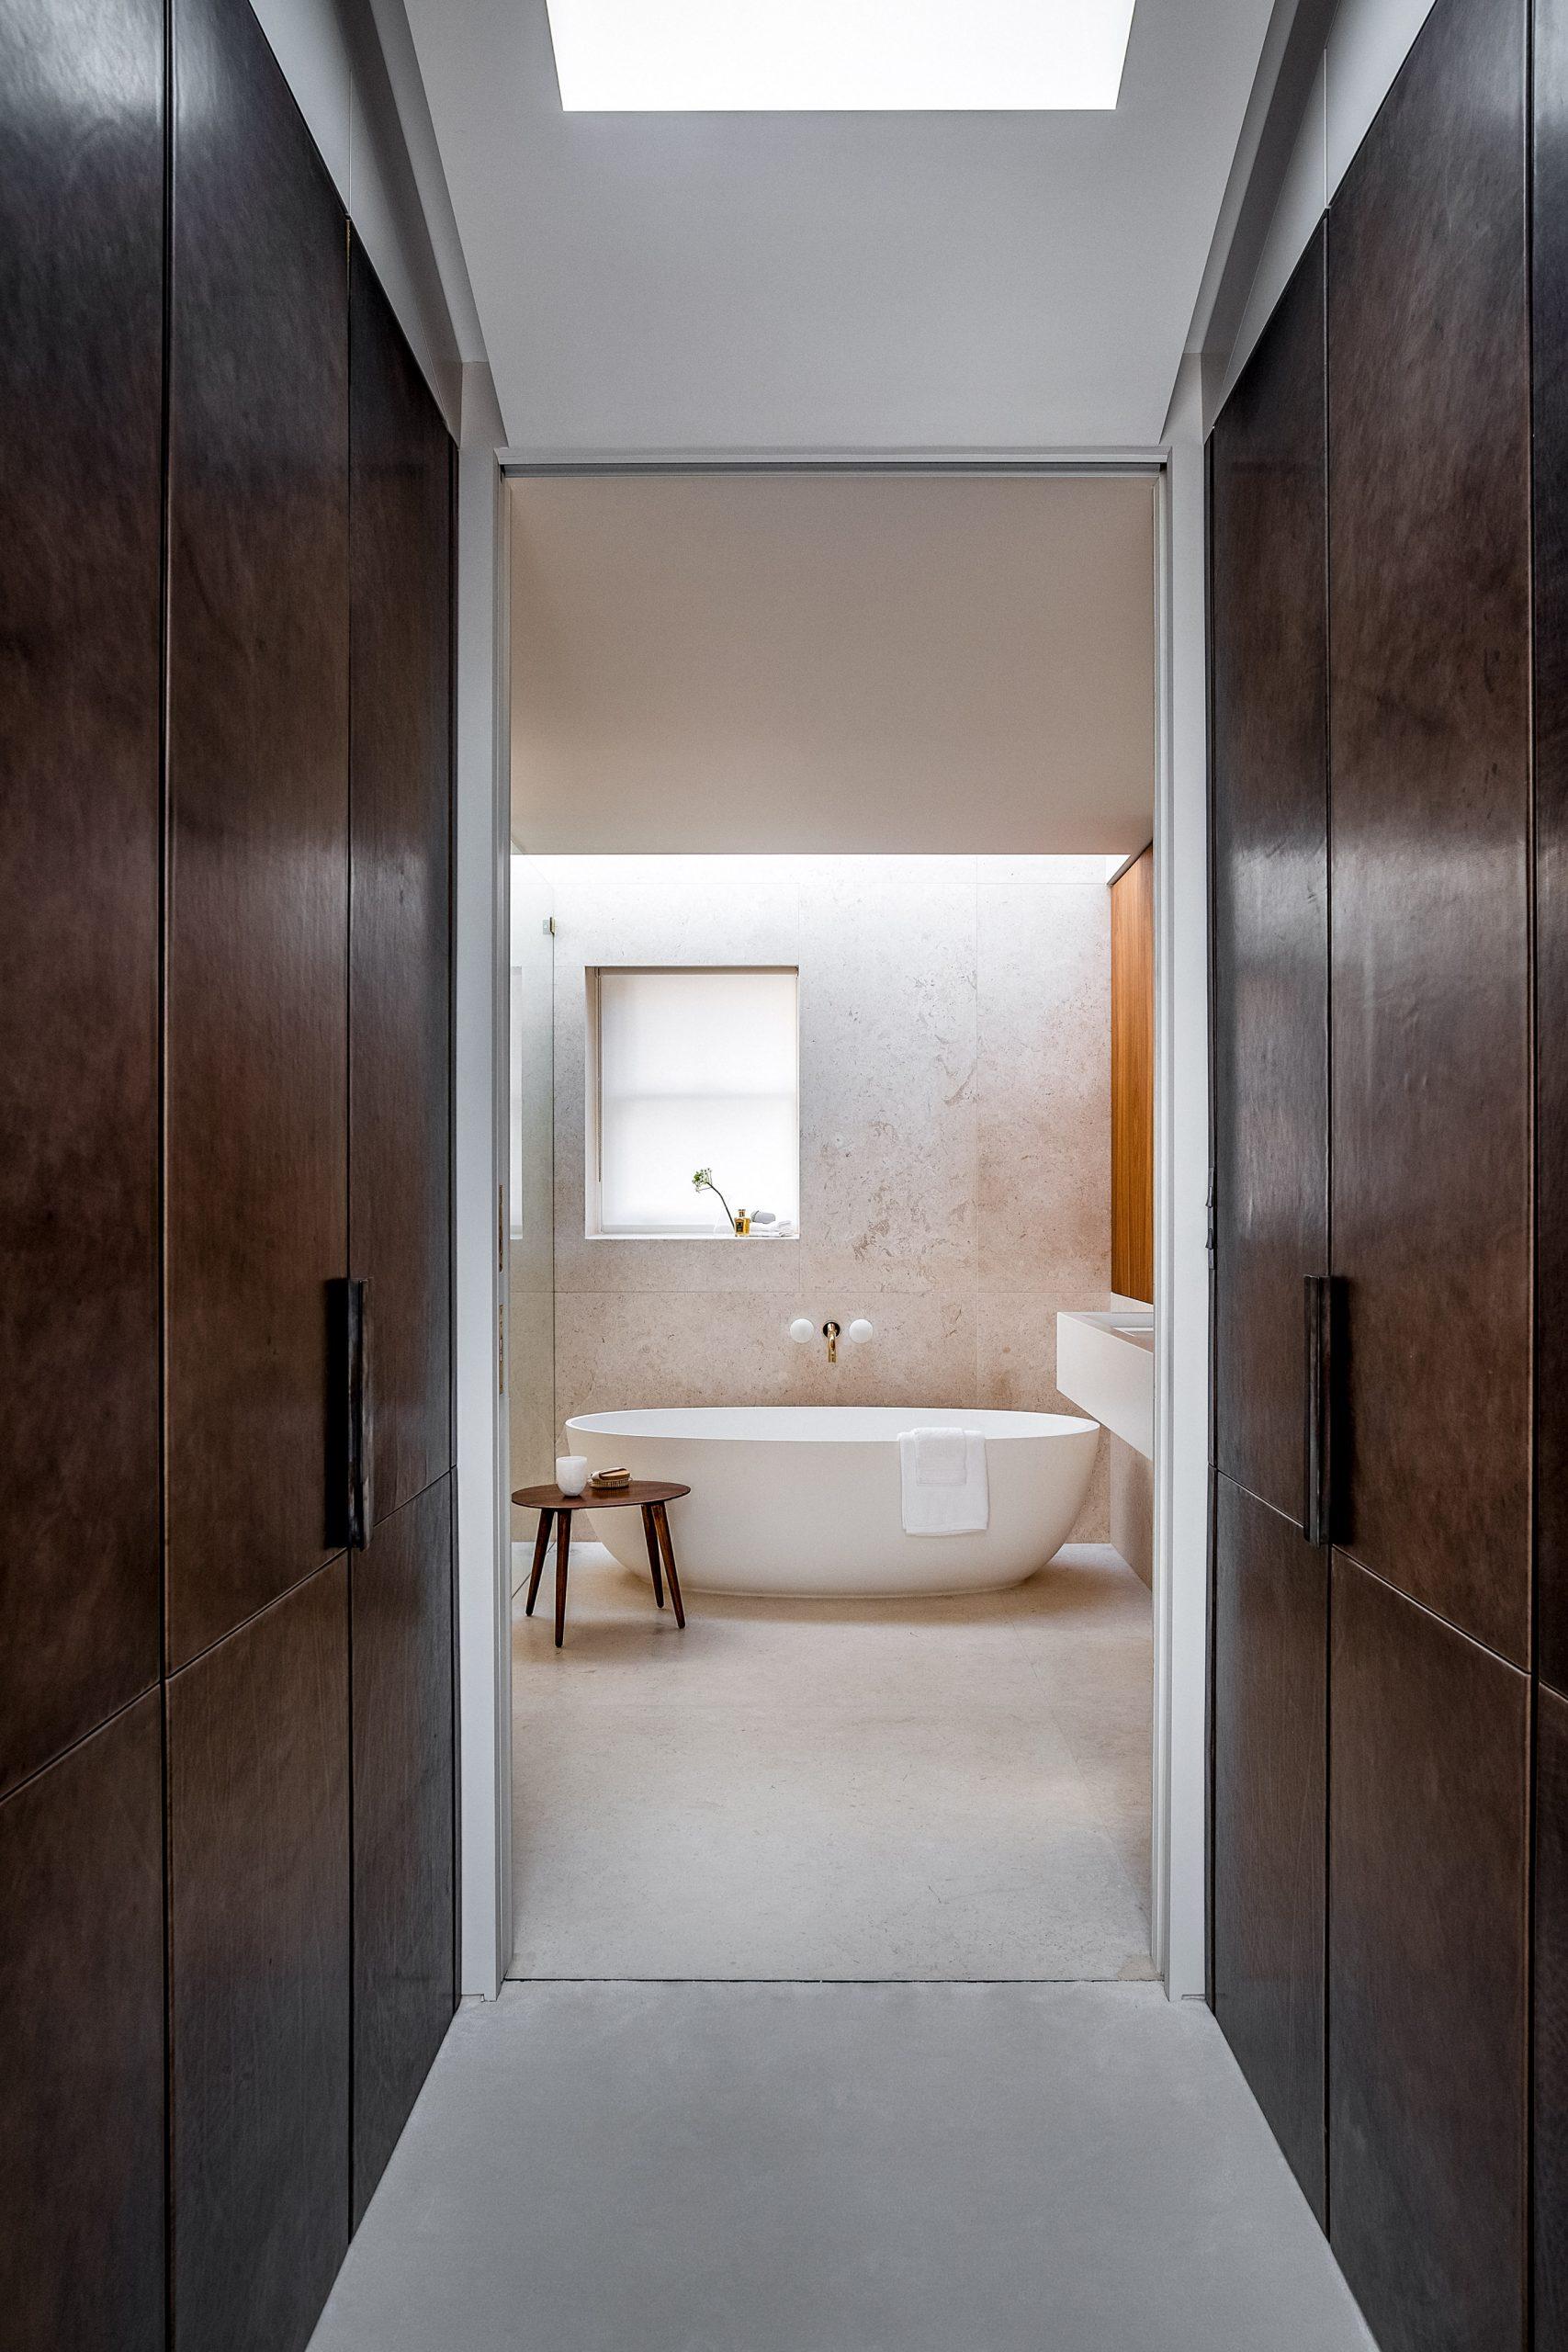 Master bathroom and wardrobe of the Knightsbridge Mews House by Echlin